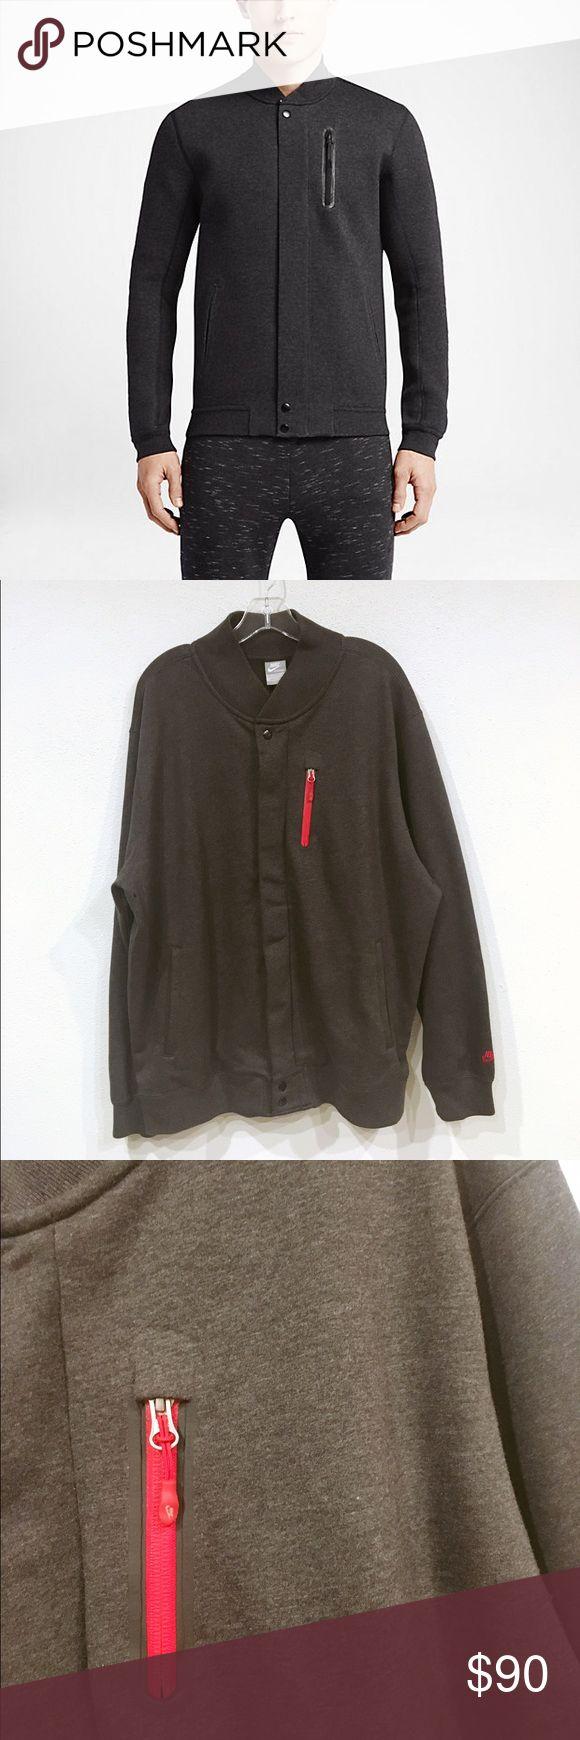 ‼️LAST CHANCE‼️ Nike Varsity Jacket 3mm Excellent condition. No trades. 1029 Nike Jackets & Coats Bomber & Varsity